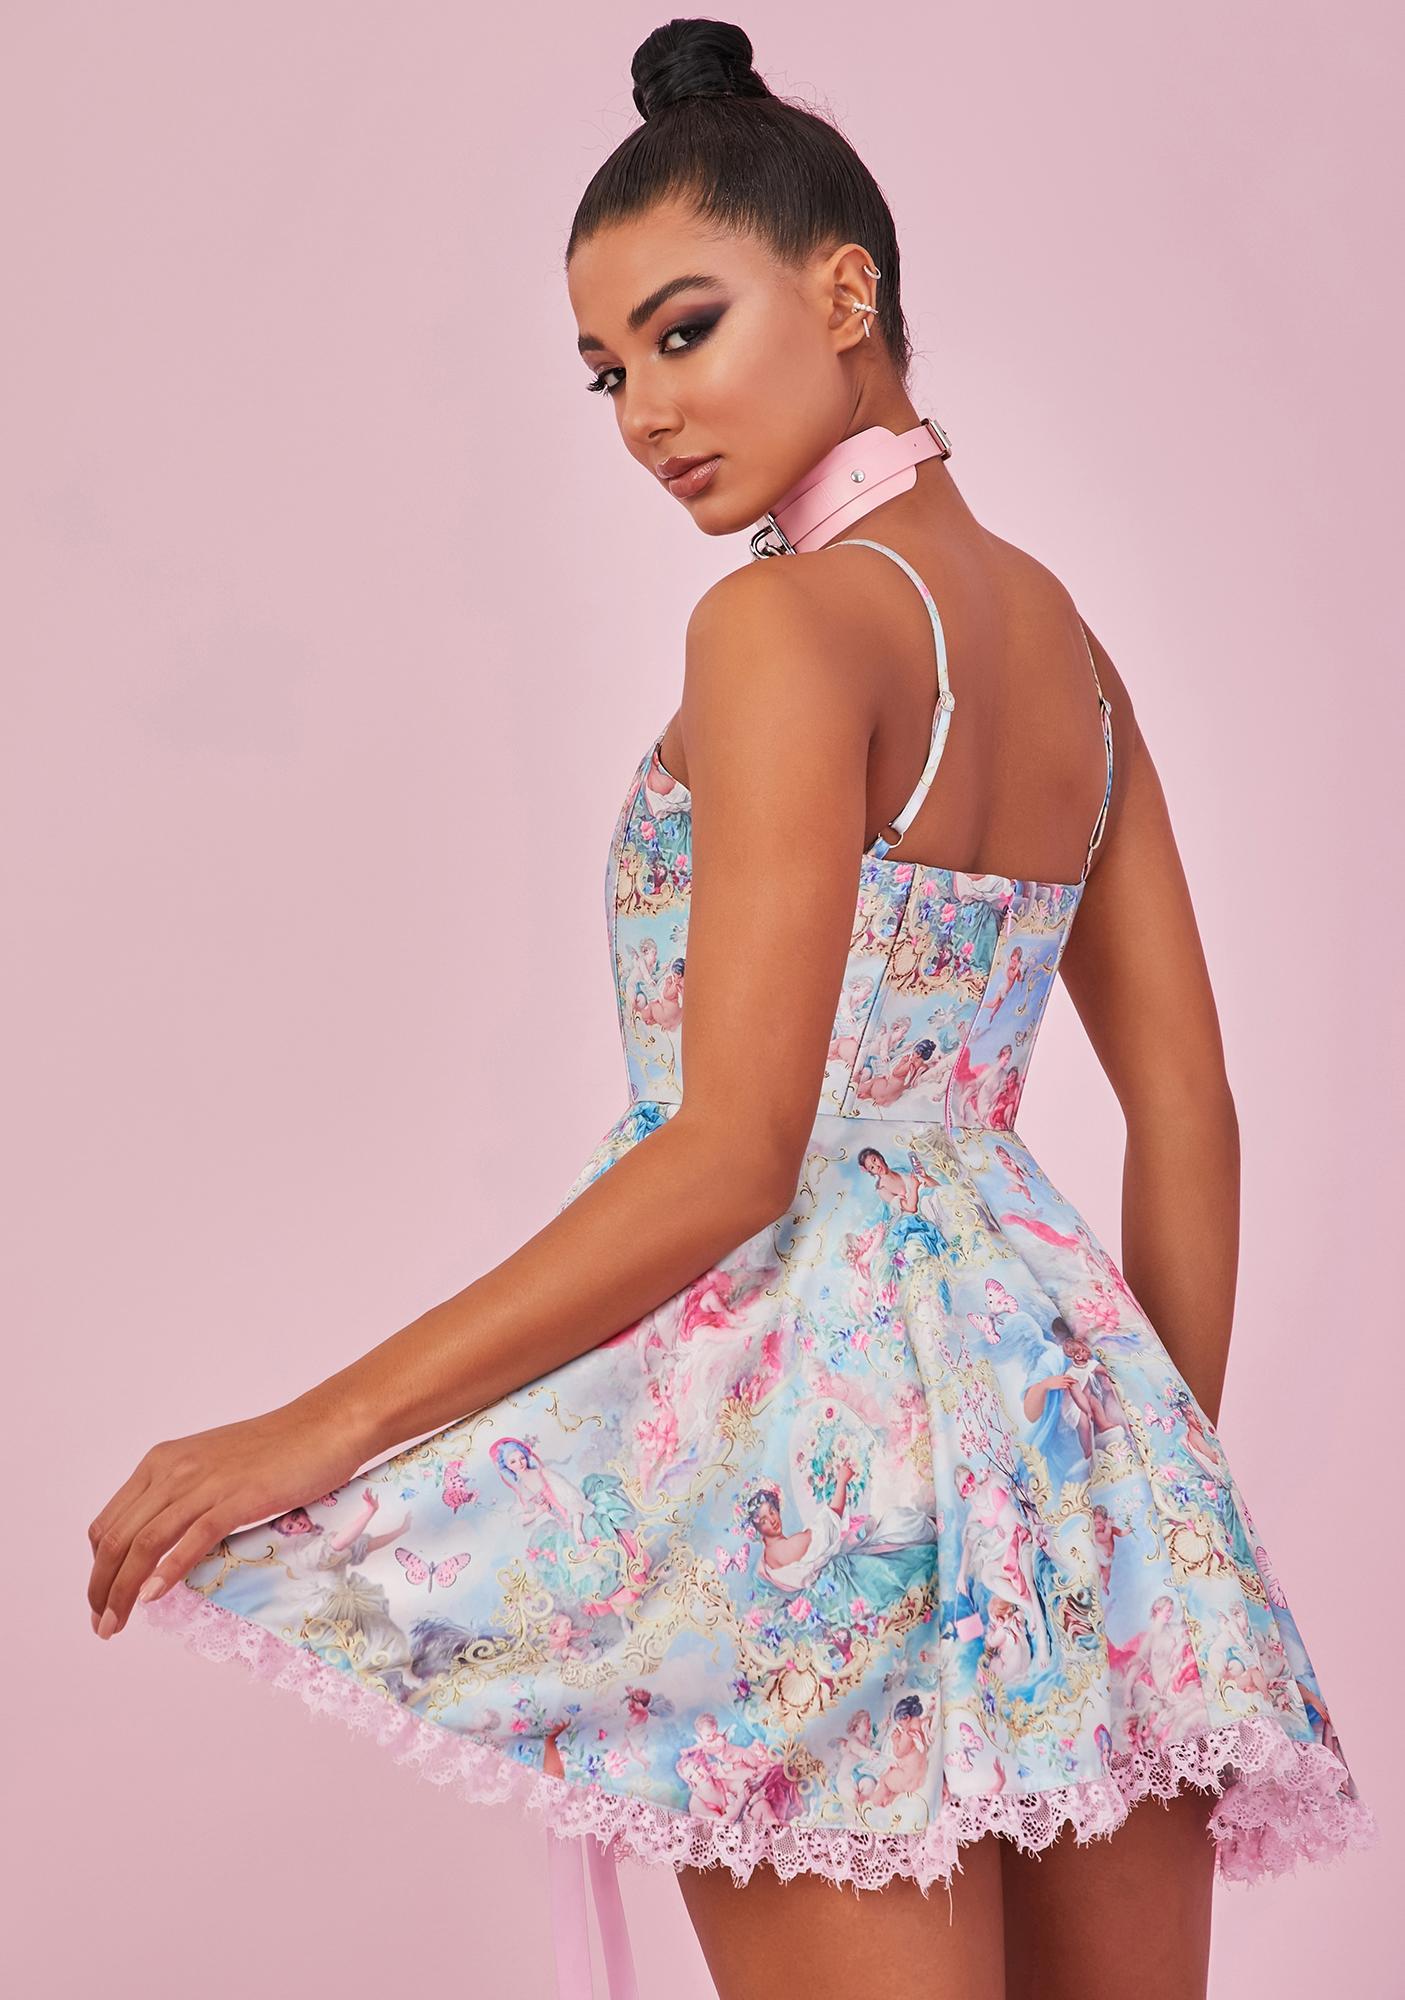 Sugar Thrillz Divine Lush Opulence Corset Dress